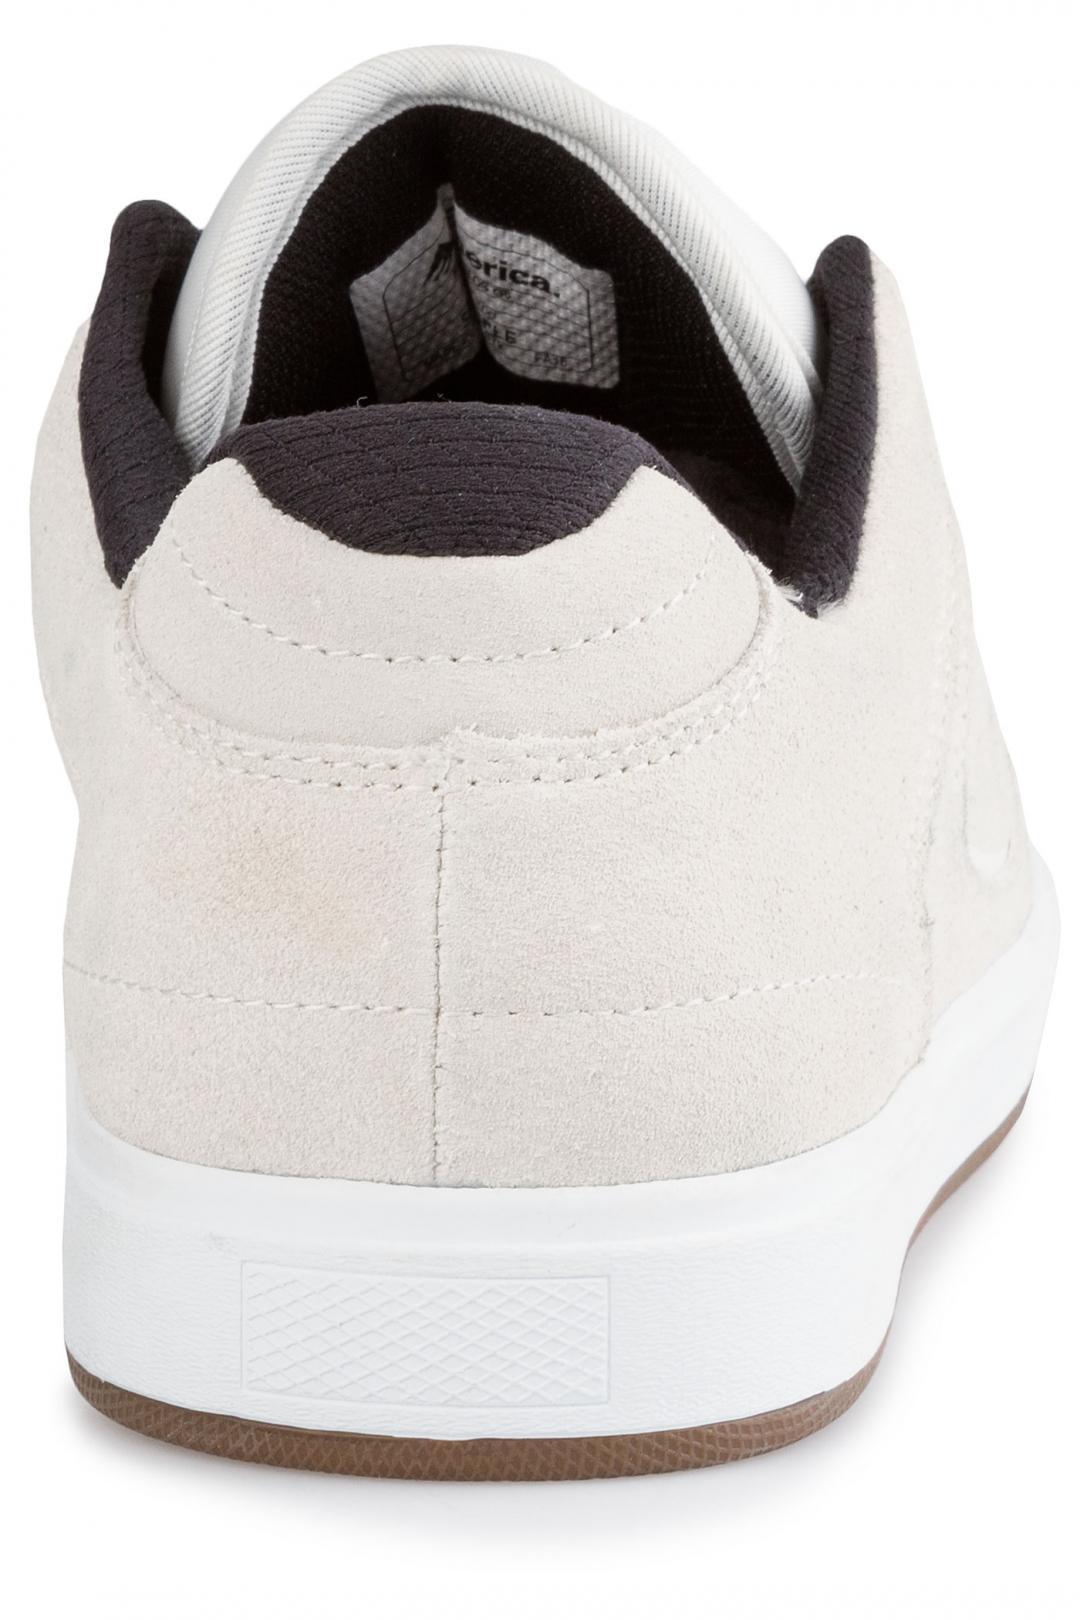 Uomo Emerica Reynolds G6 white | Scarpe da skate